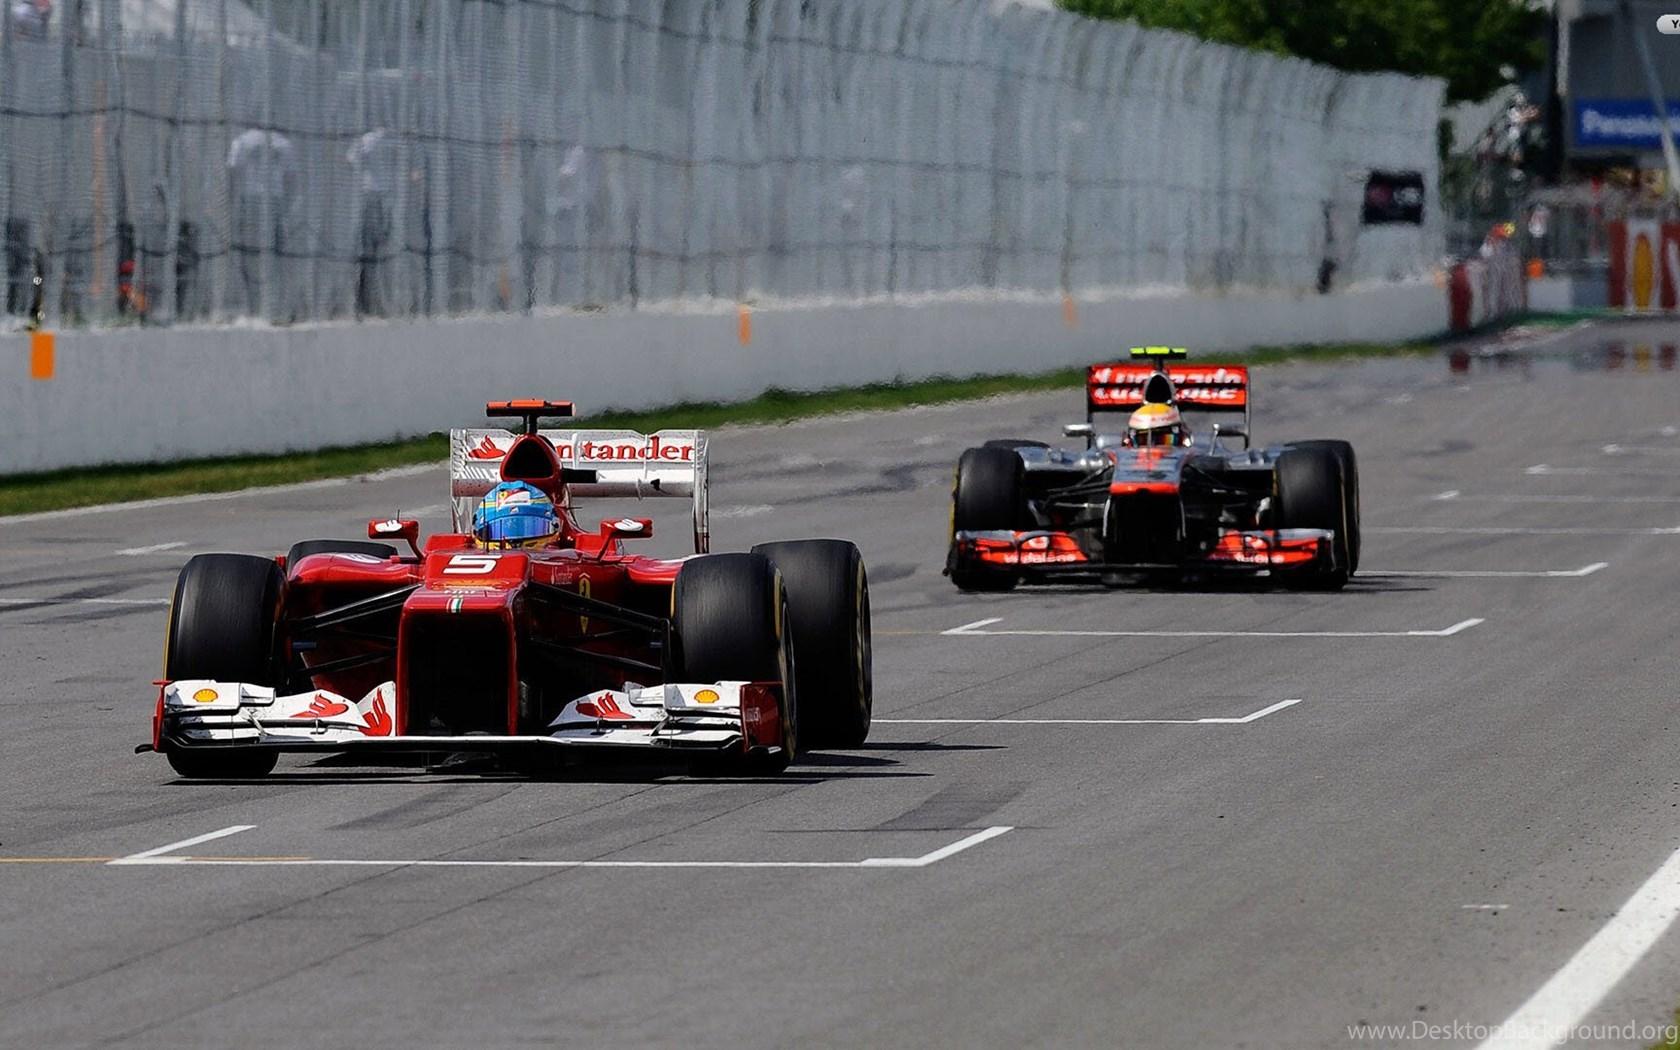 Youwall Fernando Alonso F1 Wallpapers Wallpaperwallpapers